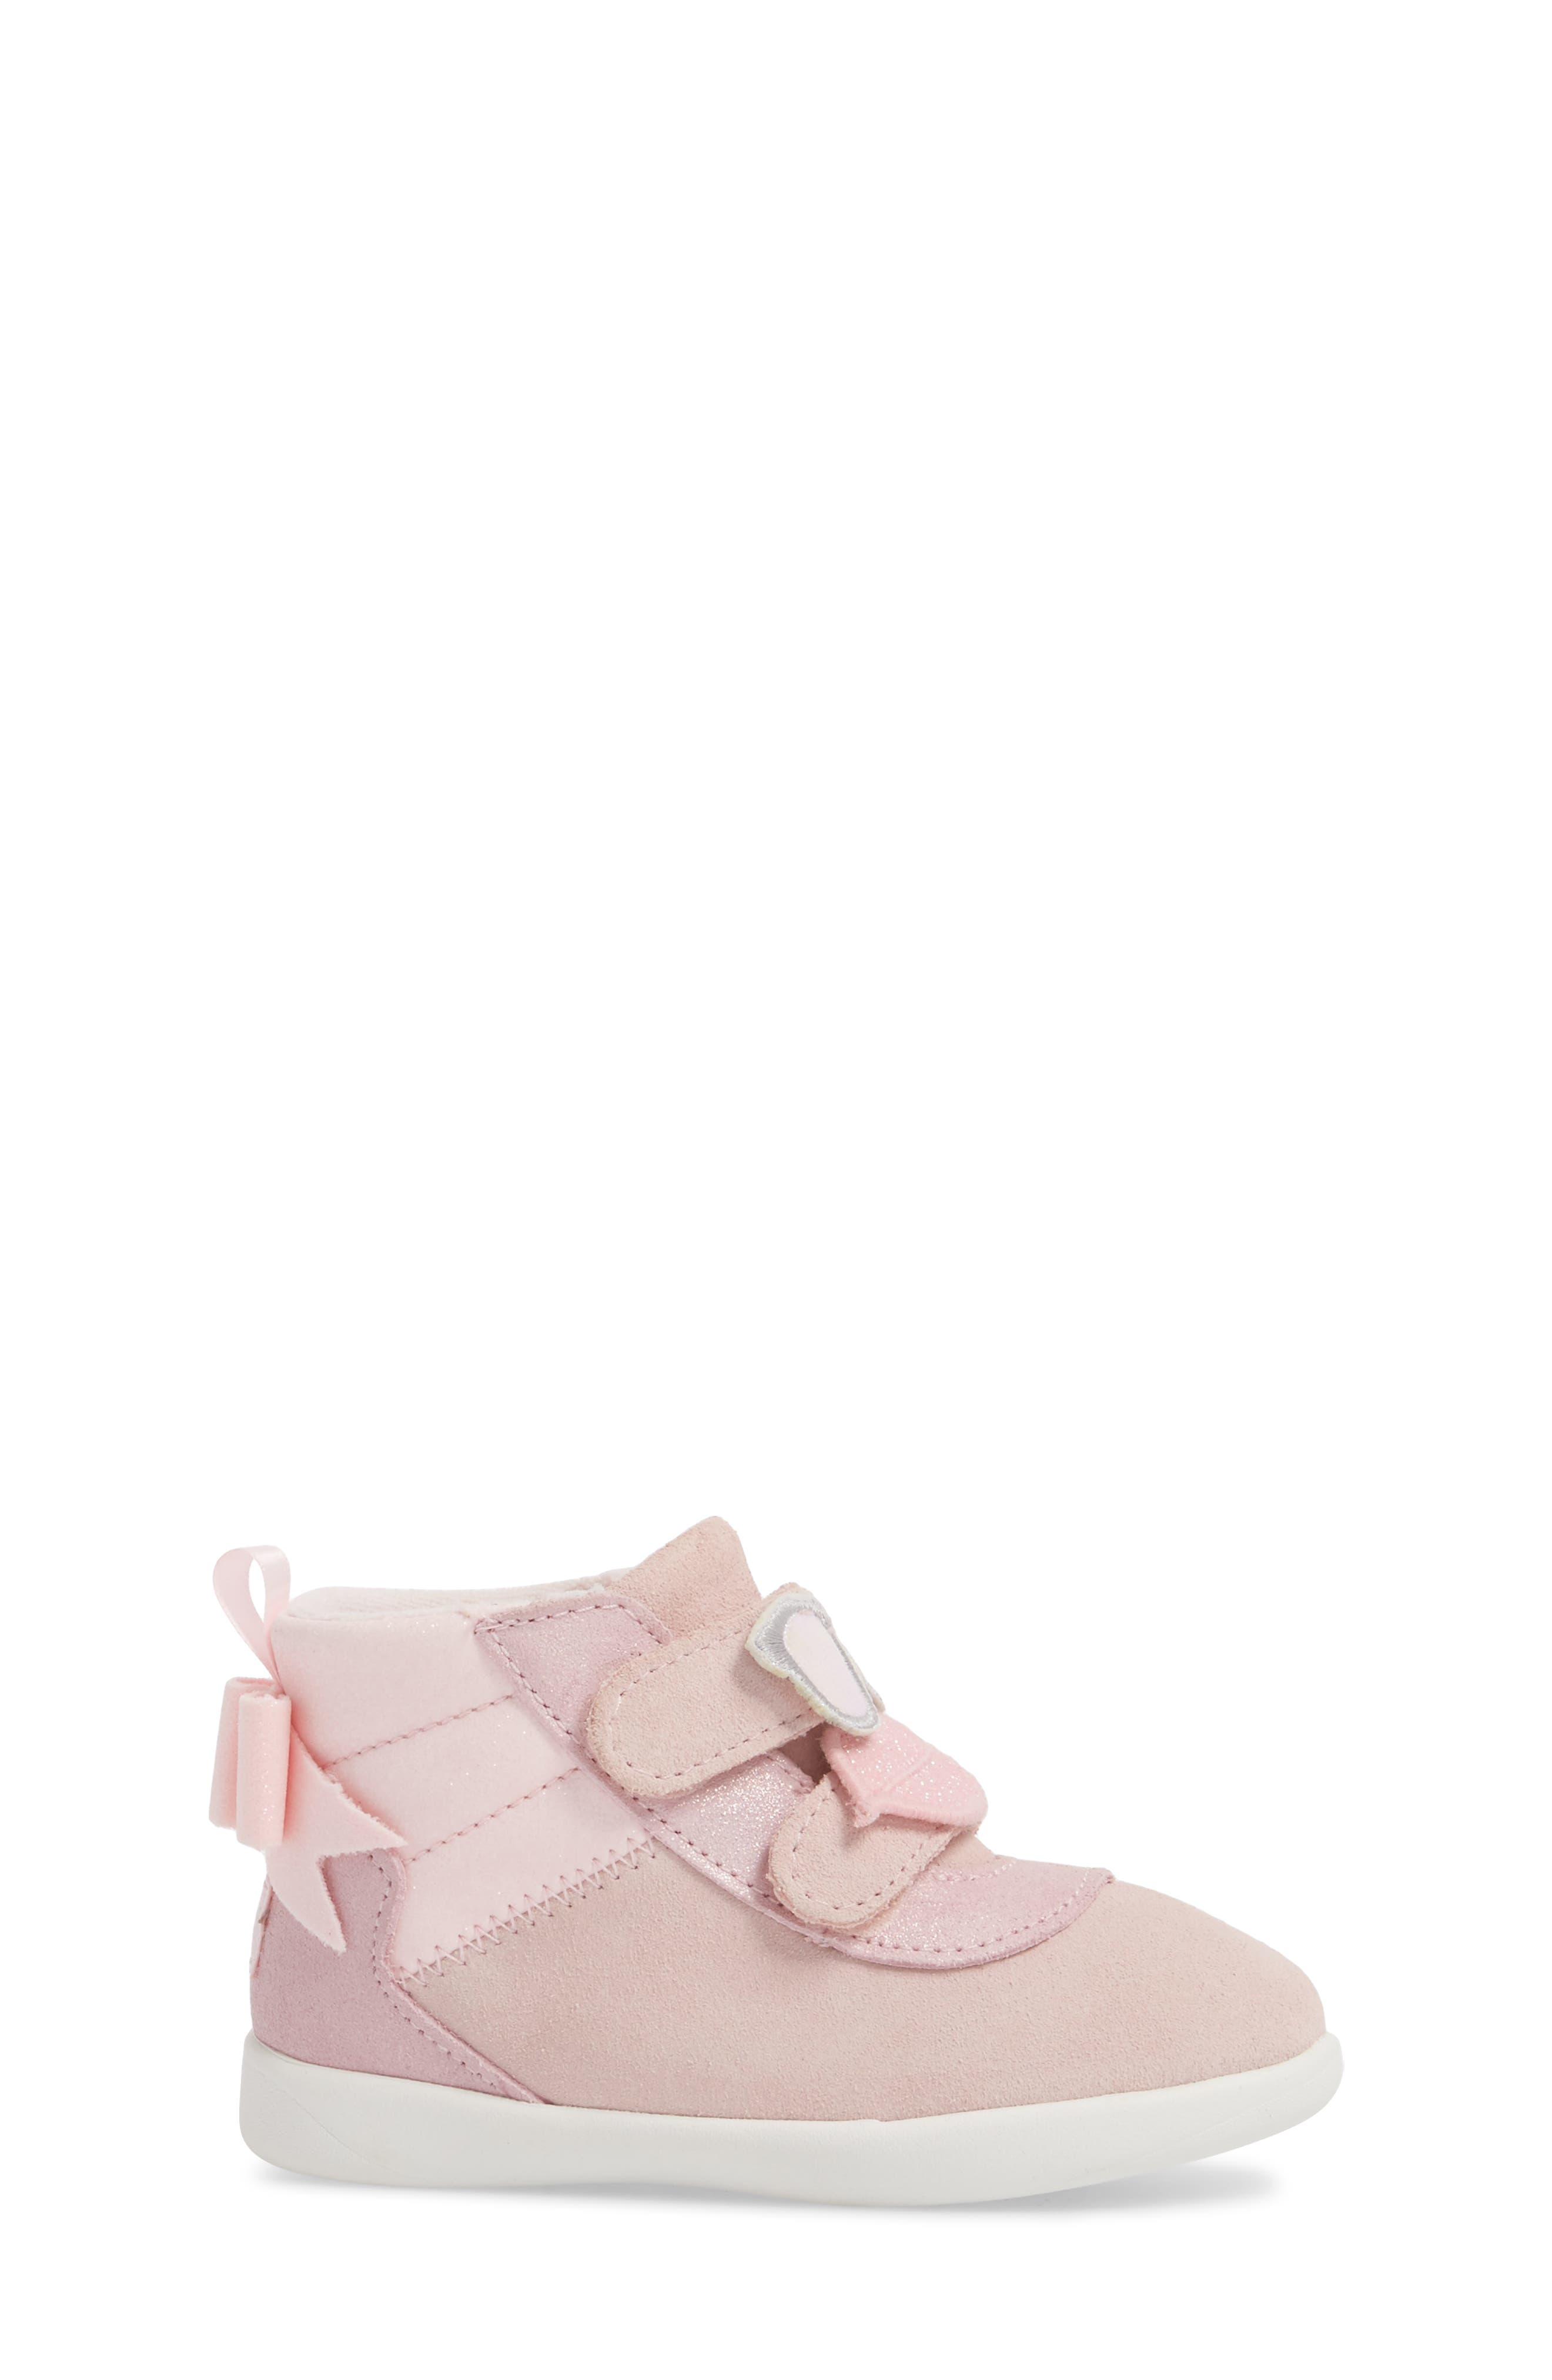 Livv Sunglass Appliqué Sneaker,                             Alternate thumbnail 3, color,                             Seashell Pink